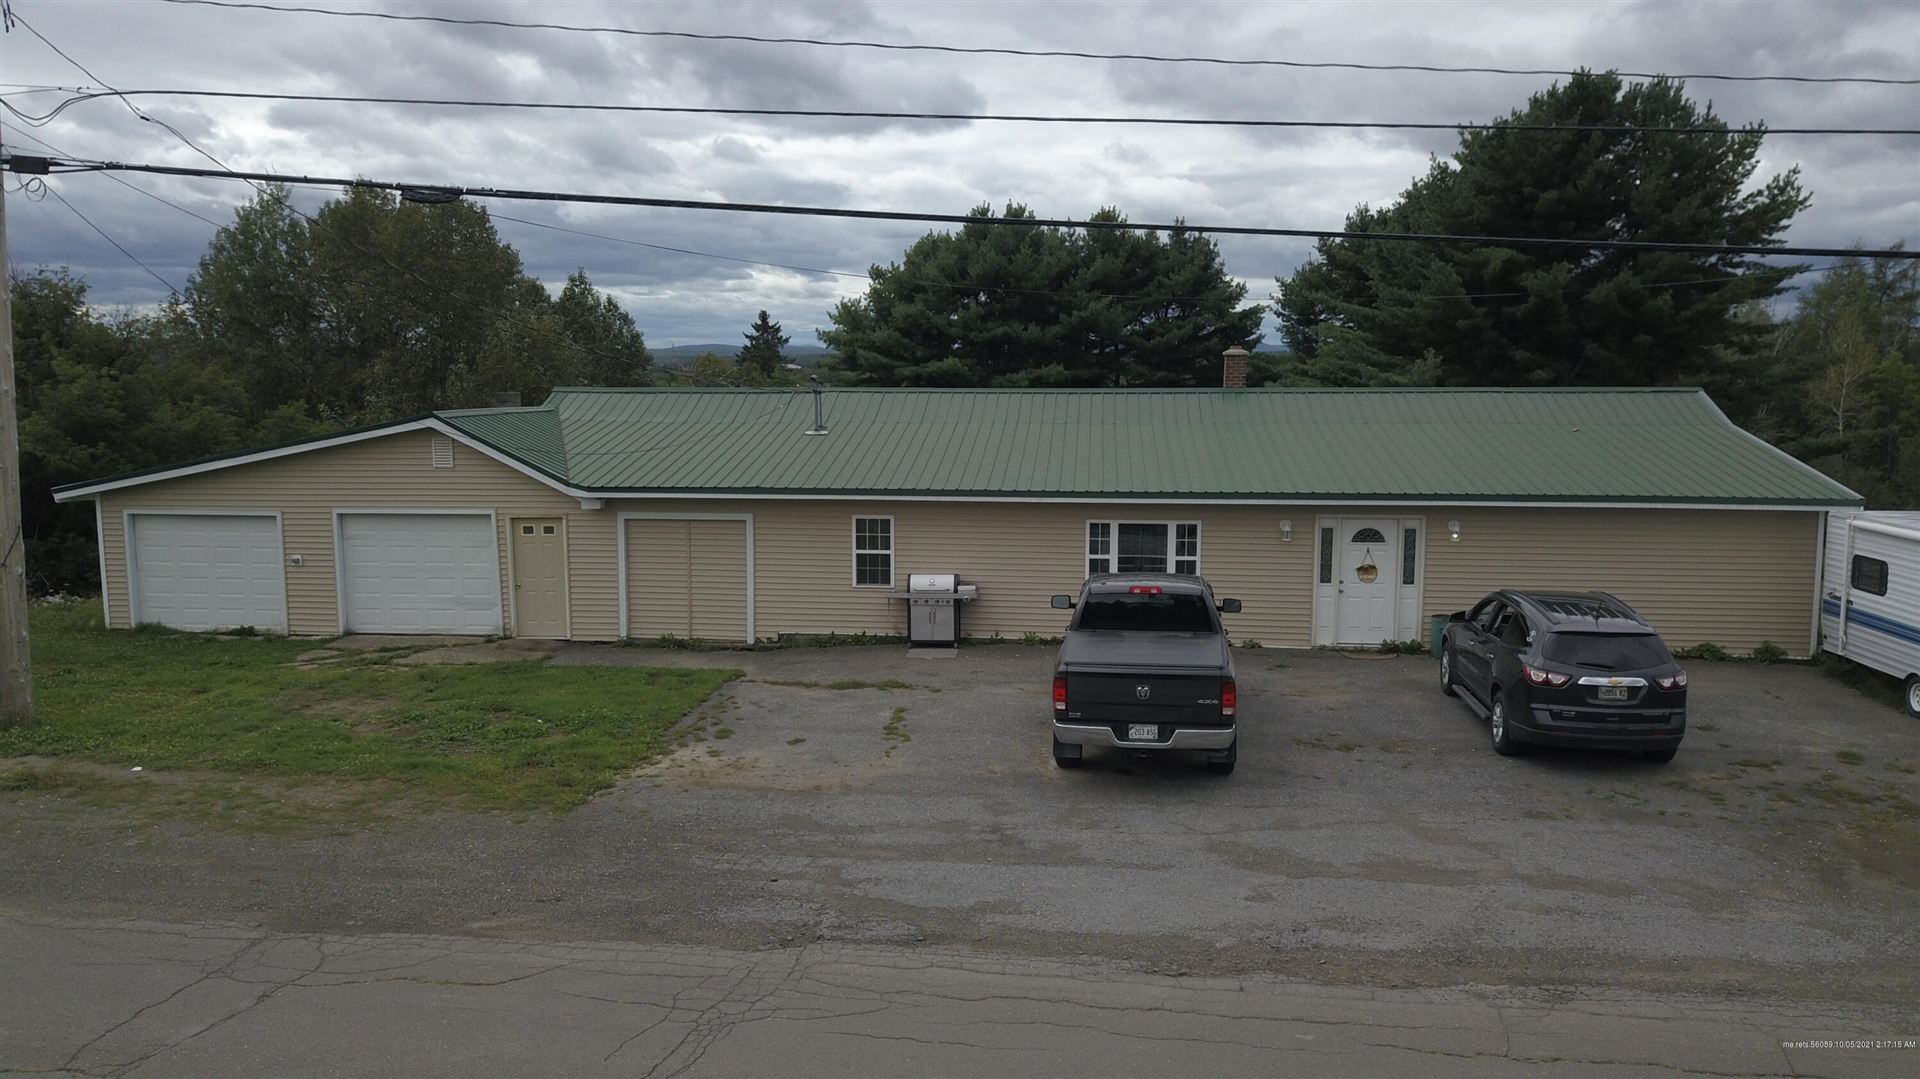 Photo of 180 Sheridan Road, Ashland, ME 04732 (MLS # 1510663)